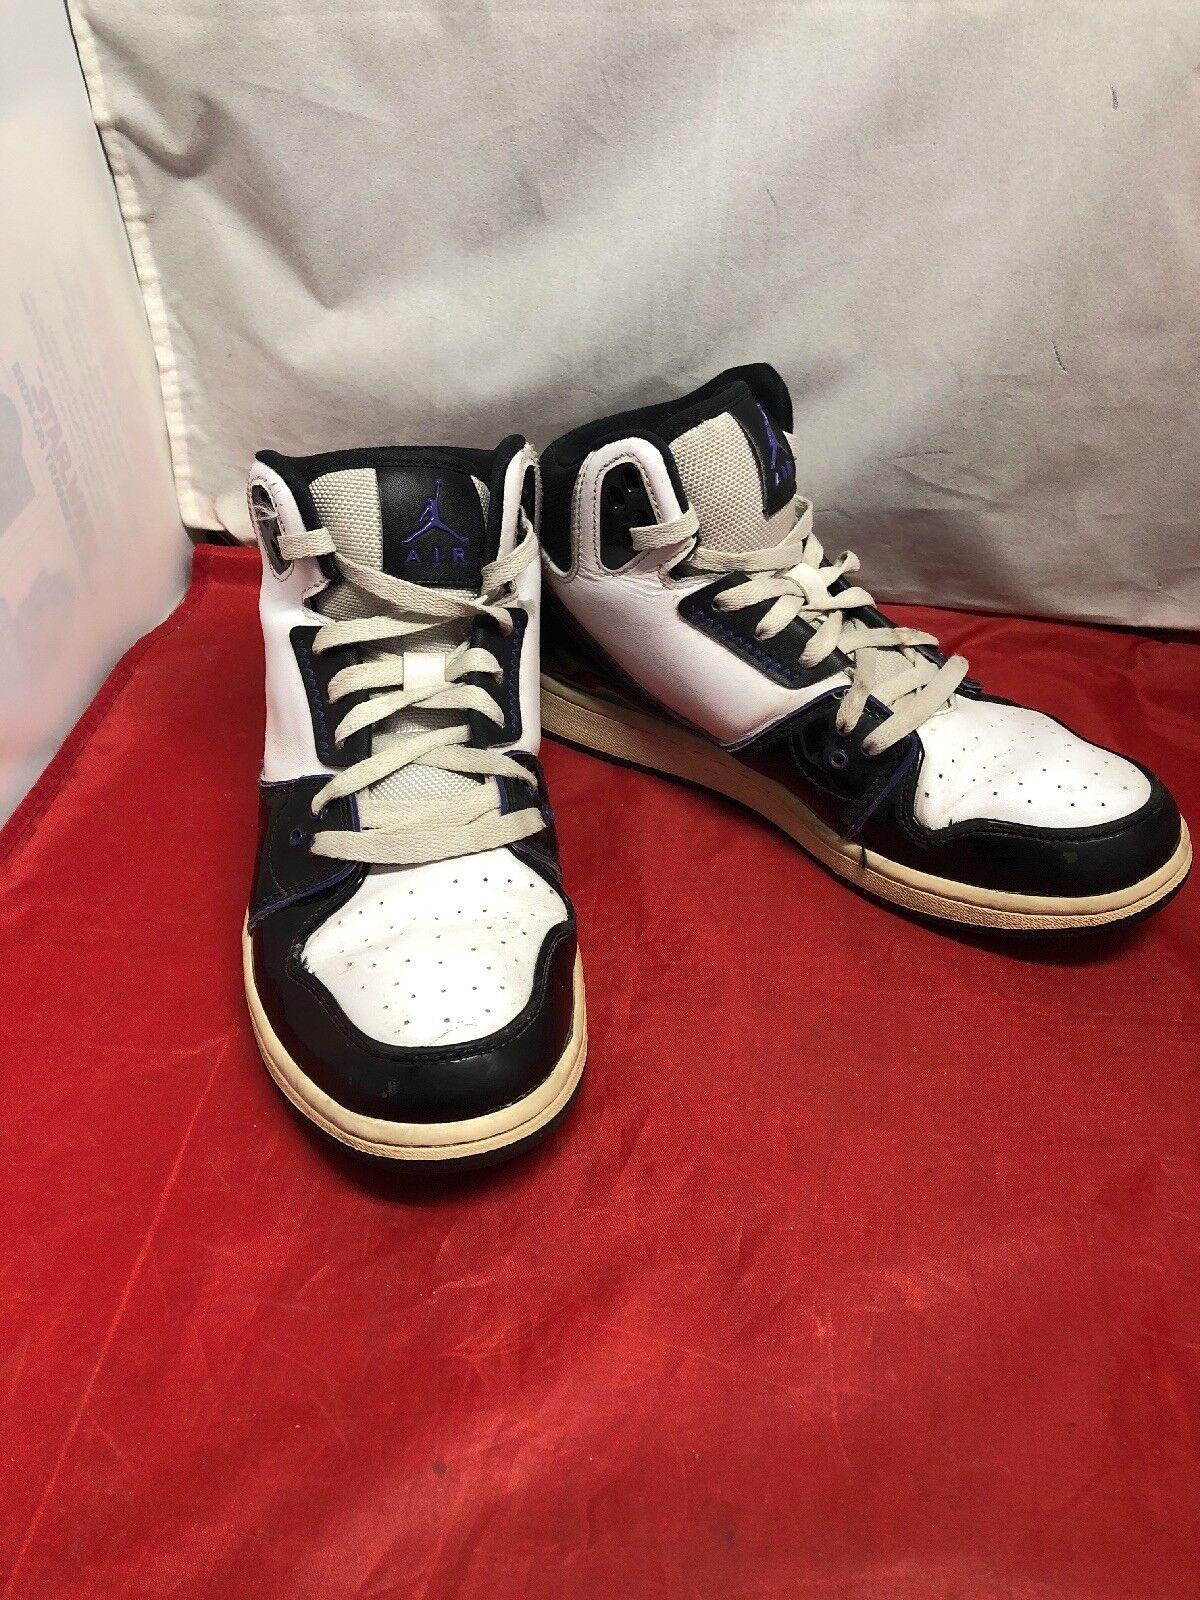 63cd9e902396b4 Nike Air Jordan 1 Flight 2 555798-153 White Black Purple Basketball ...